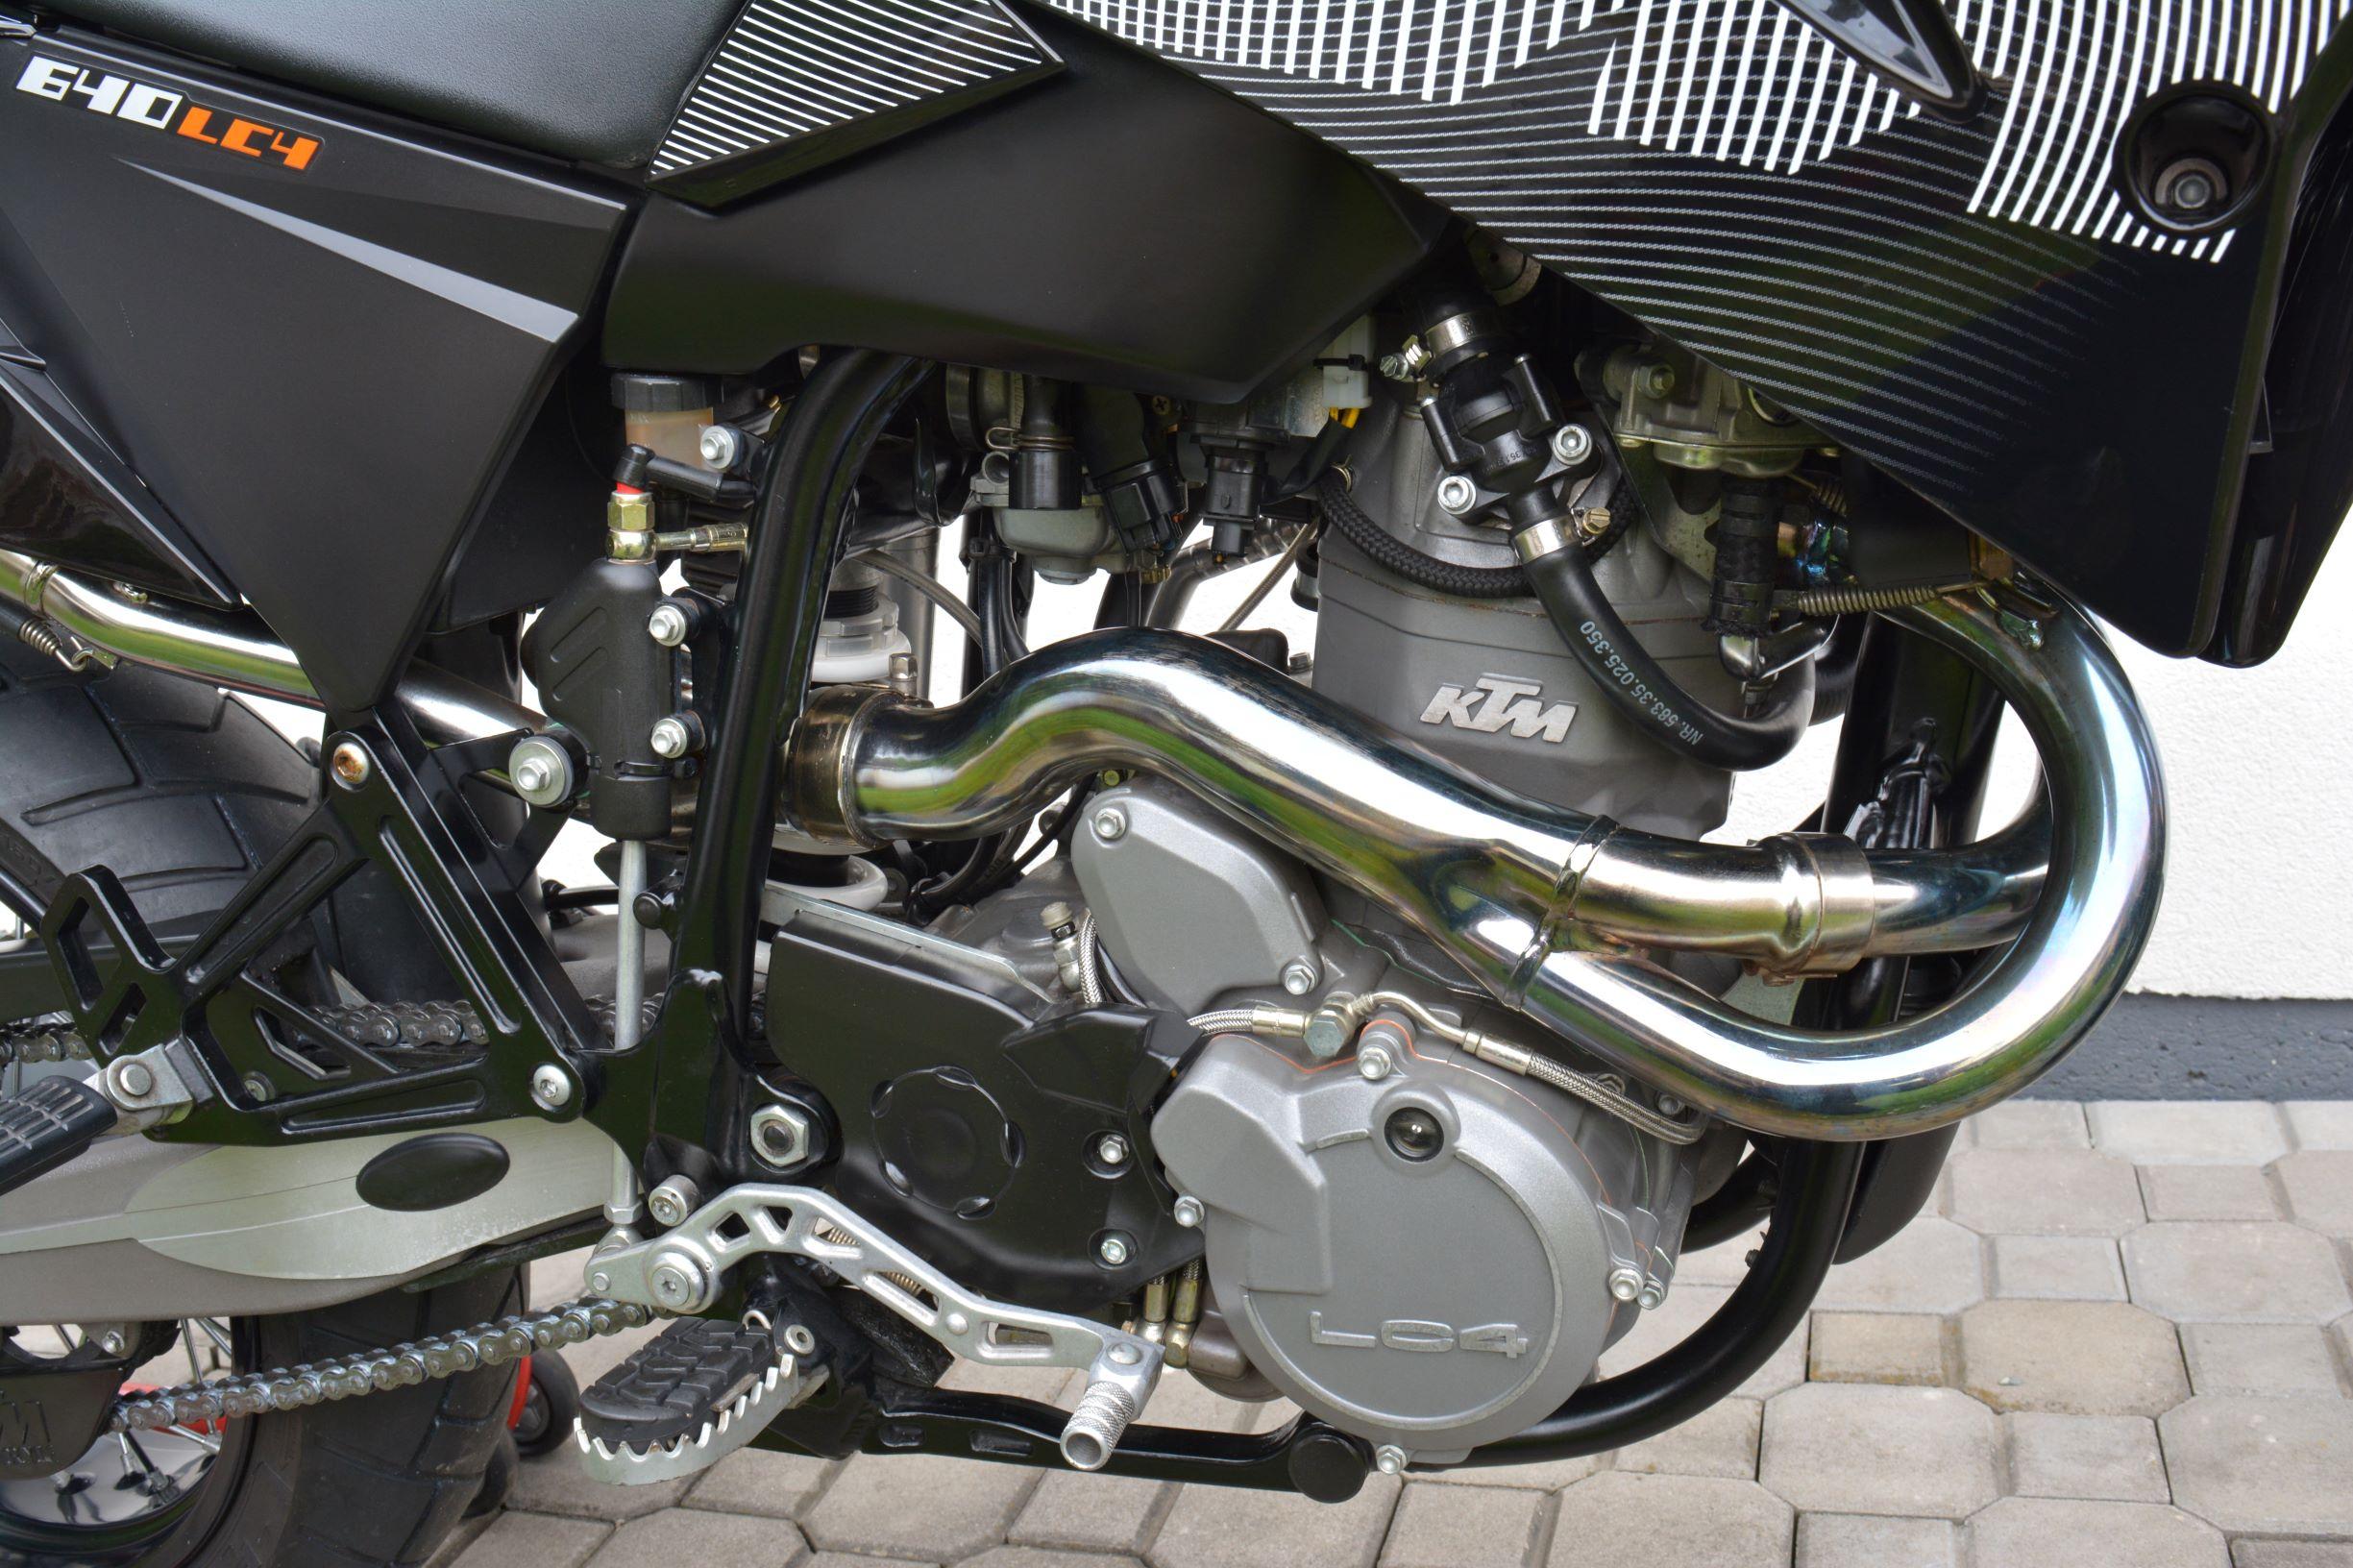 KTM 640 LC4 SM